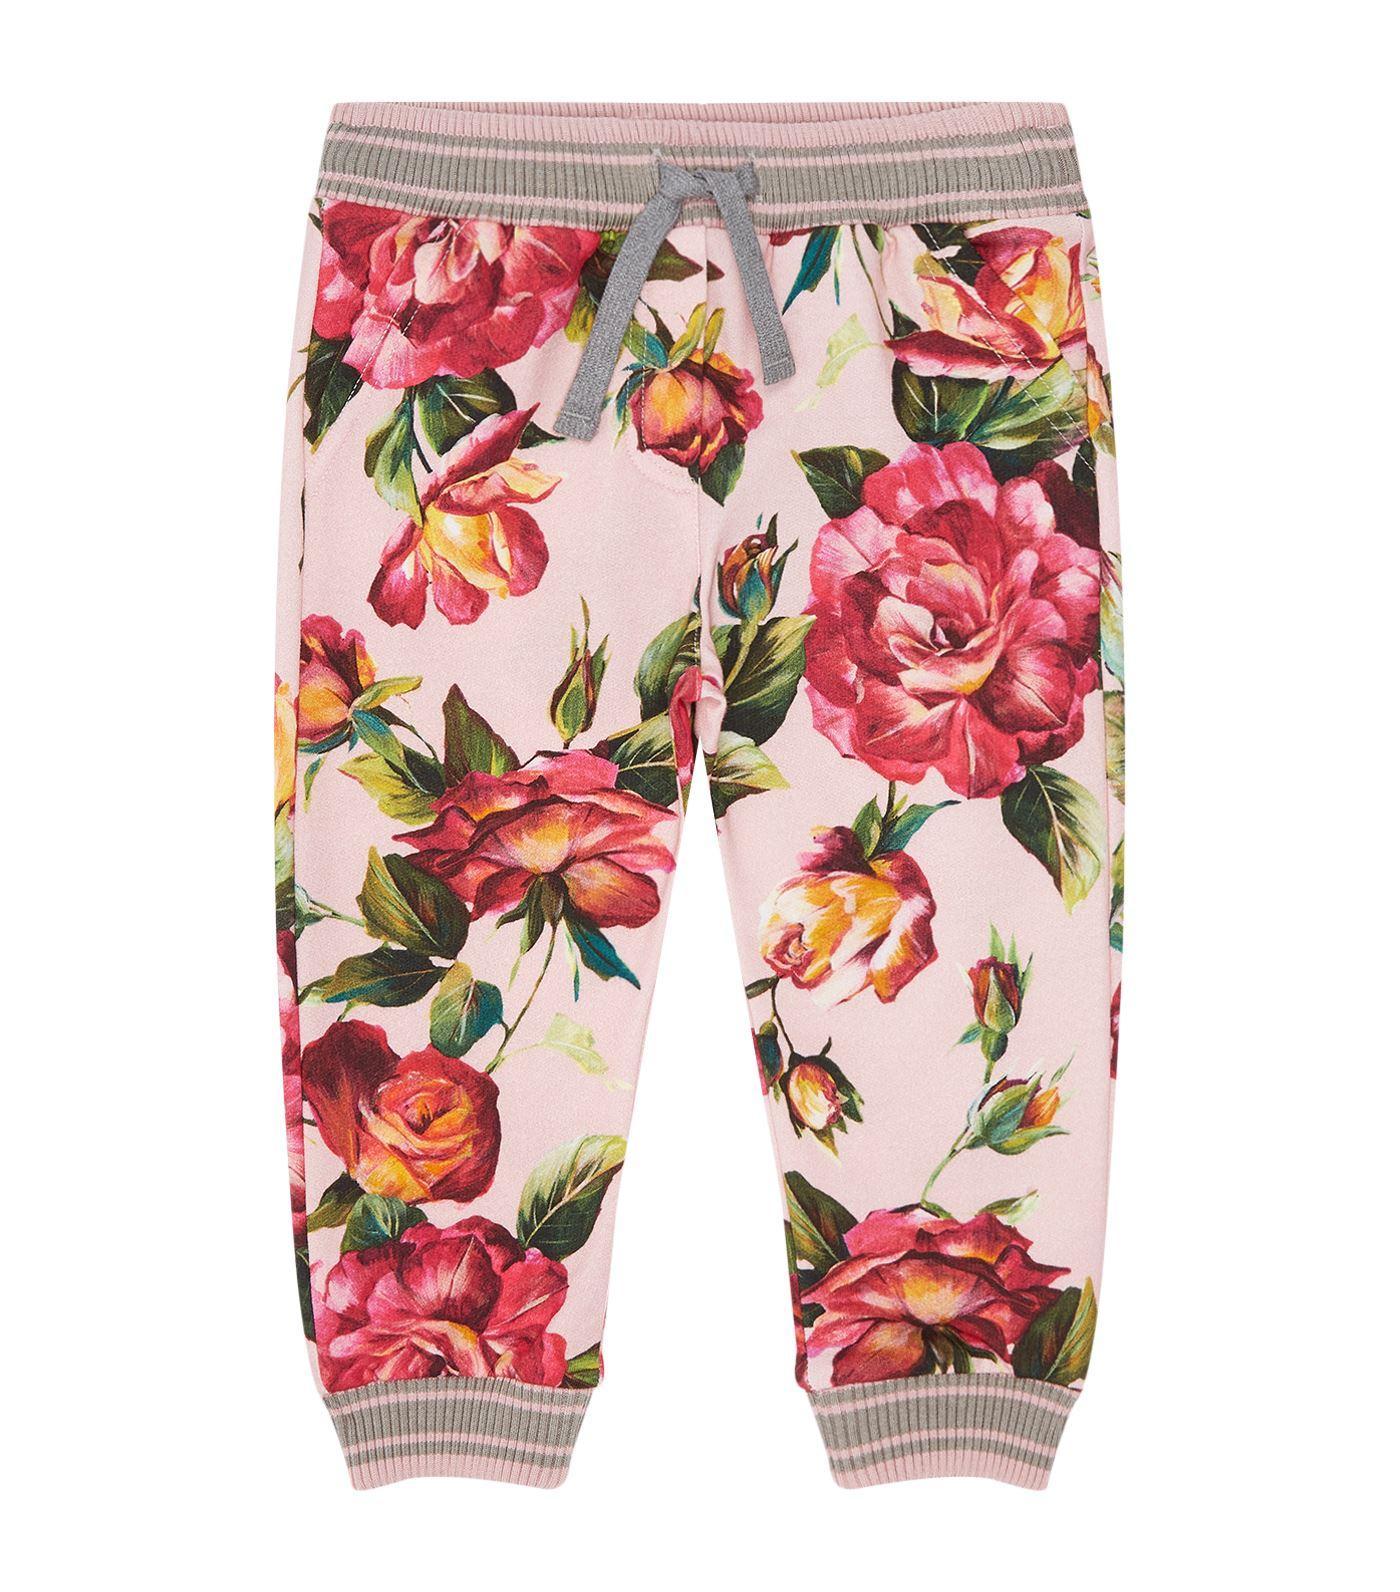 Dolce & Gabbana Rose Patterned Sweatpants In Multi